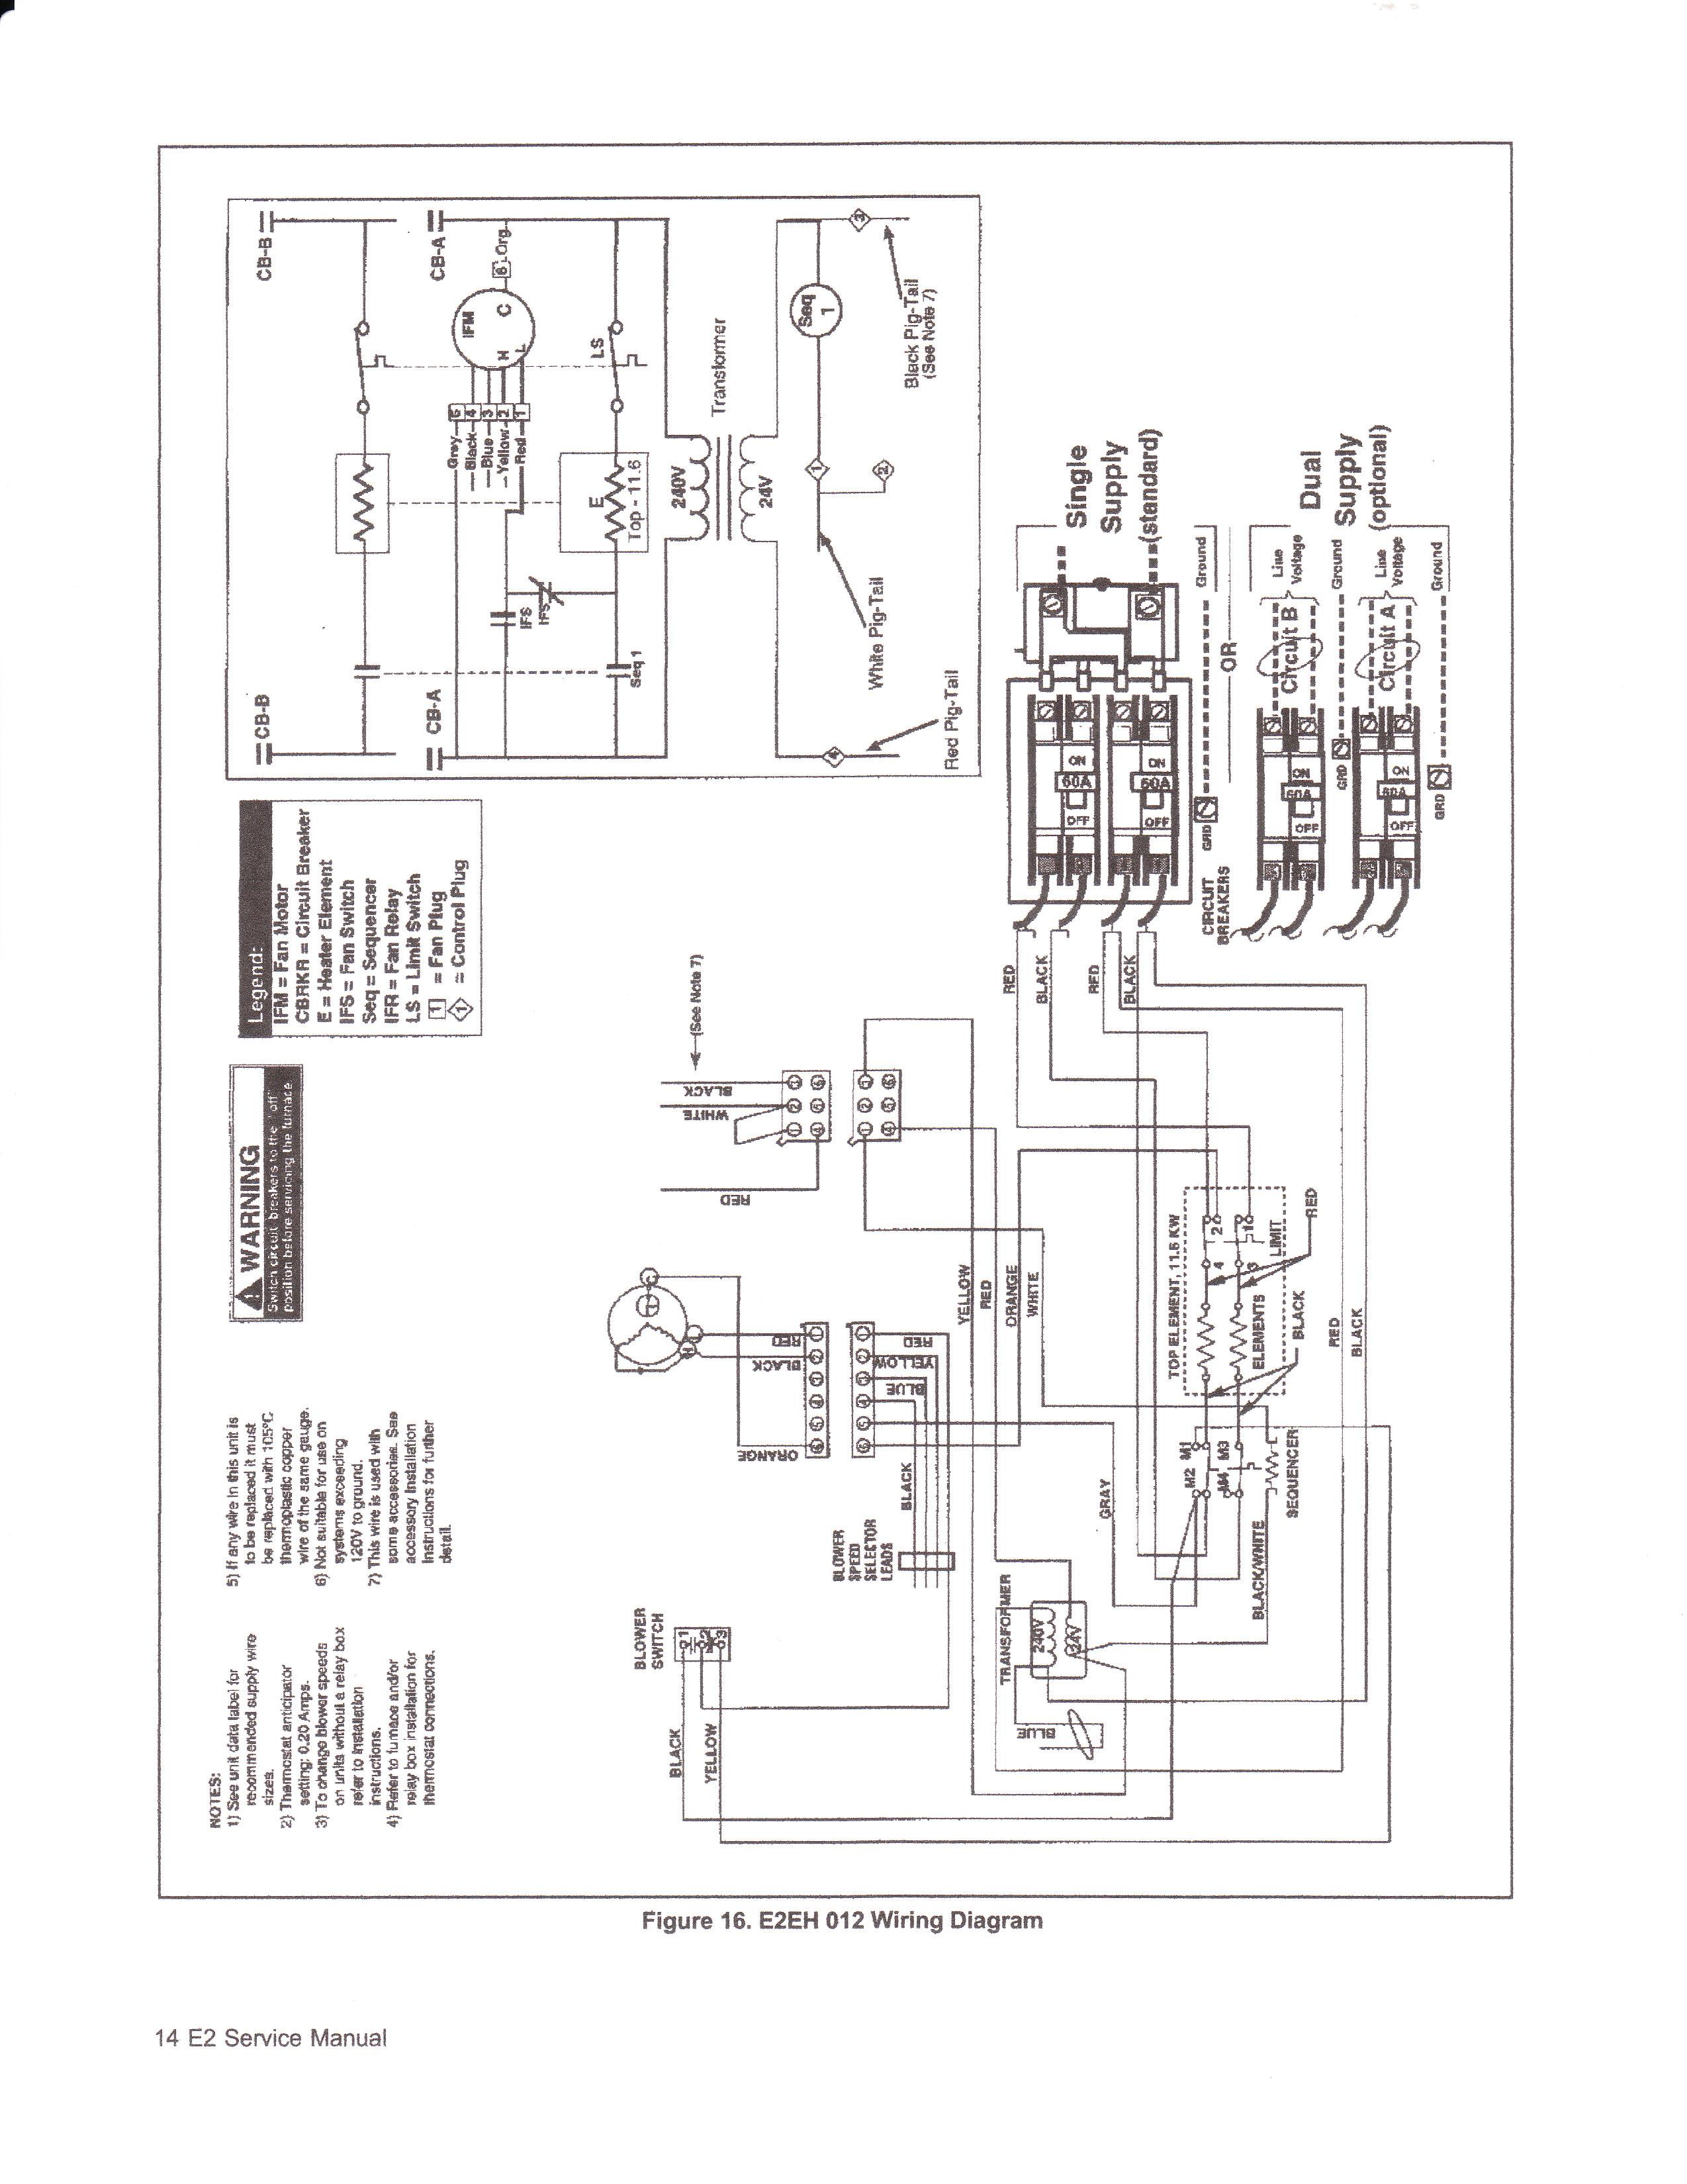 [DIAGRAM_1JK]  RS_8921] Motor Wiring Diagram As Well Furnace Blower Motor Repalcement  Parts Free Diagram | Intertherm Wiring Diagram Condenser |  | Www Mohammedshrine Librar Wiring 101